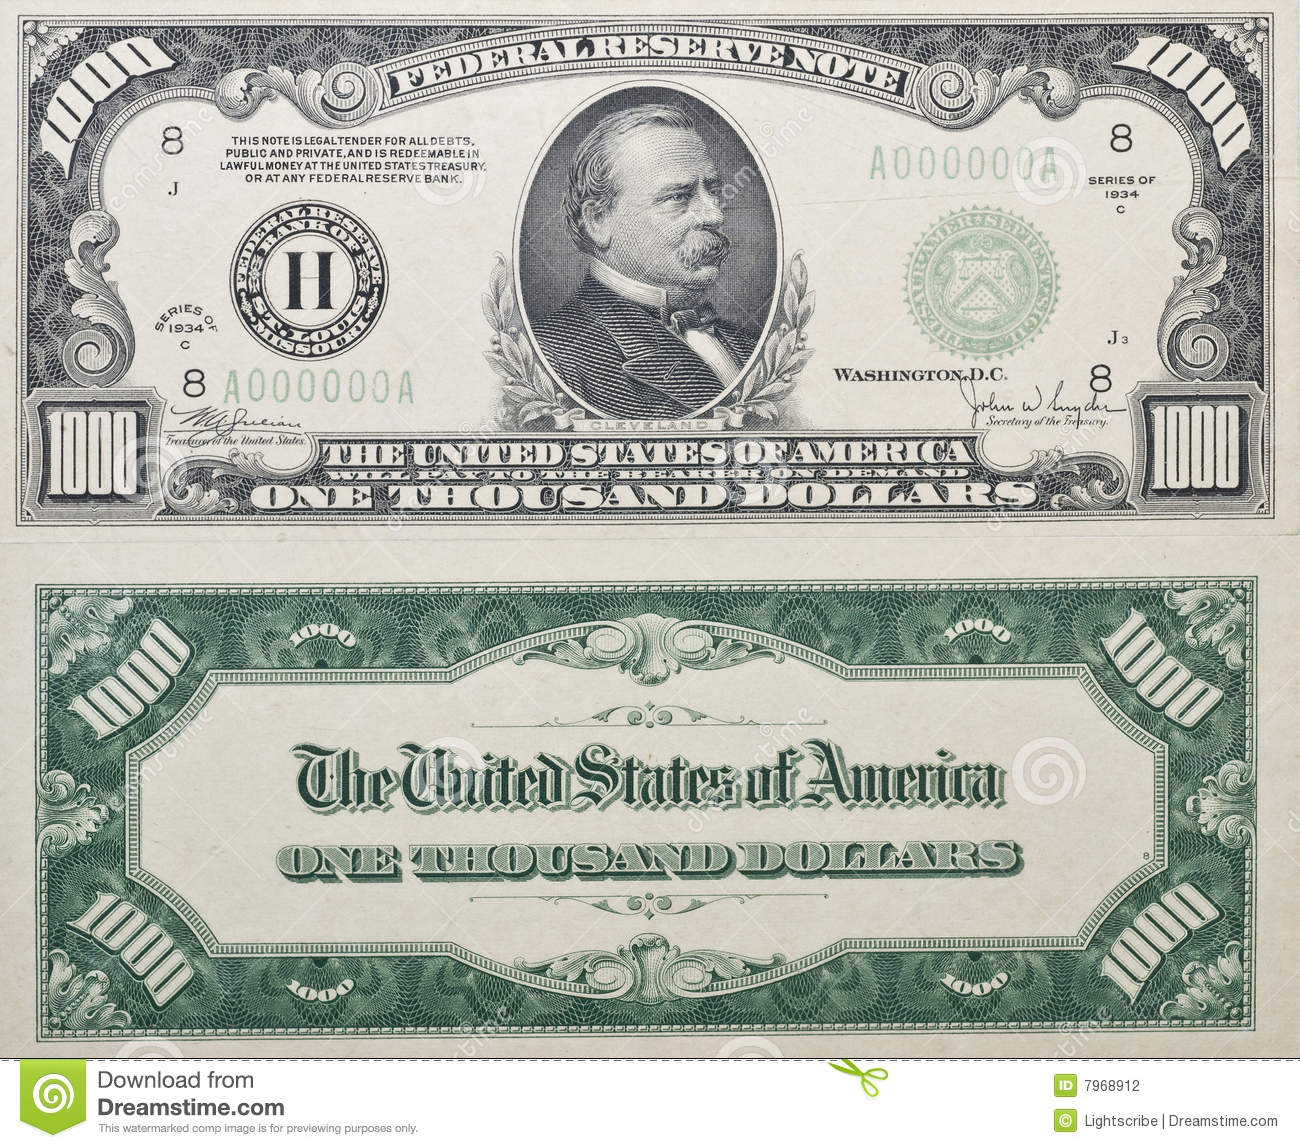 1000 bill clipart image freeuse library 1000 dollar bill clipart 6 » Clipart Station image freeuse library